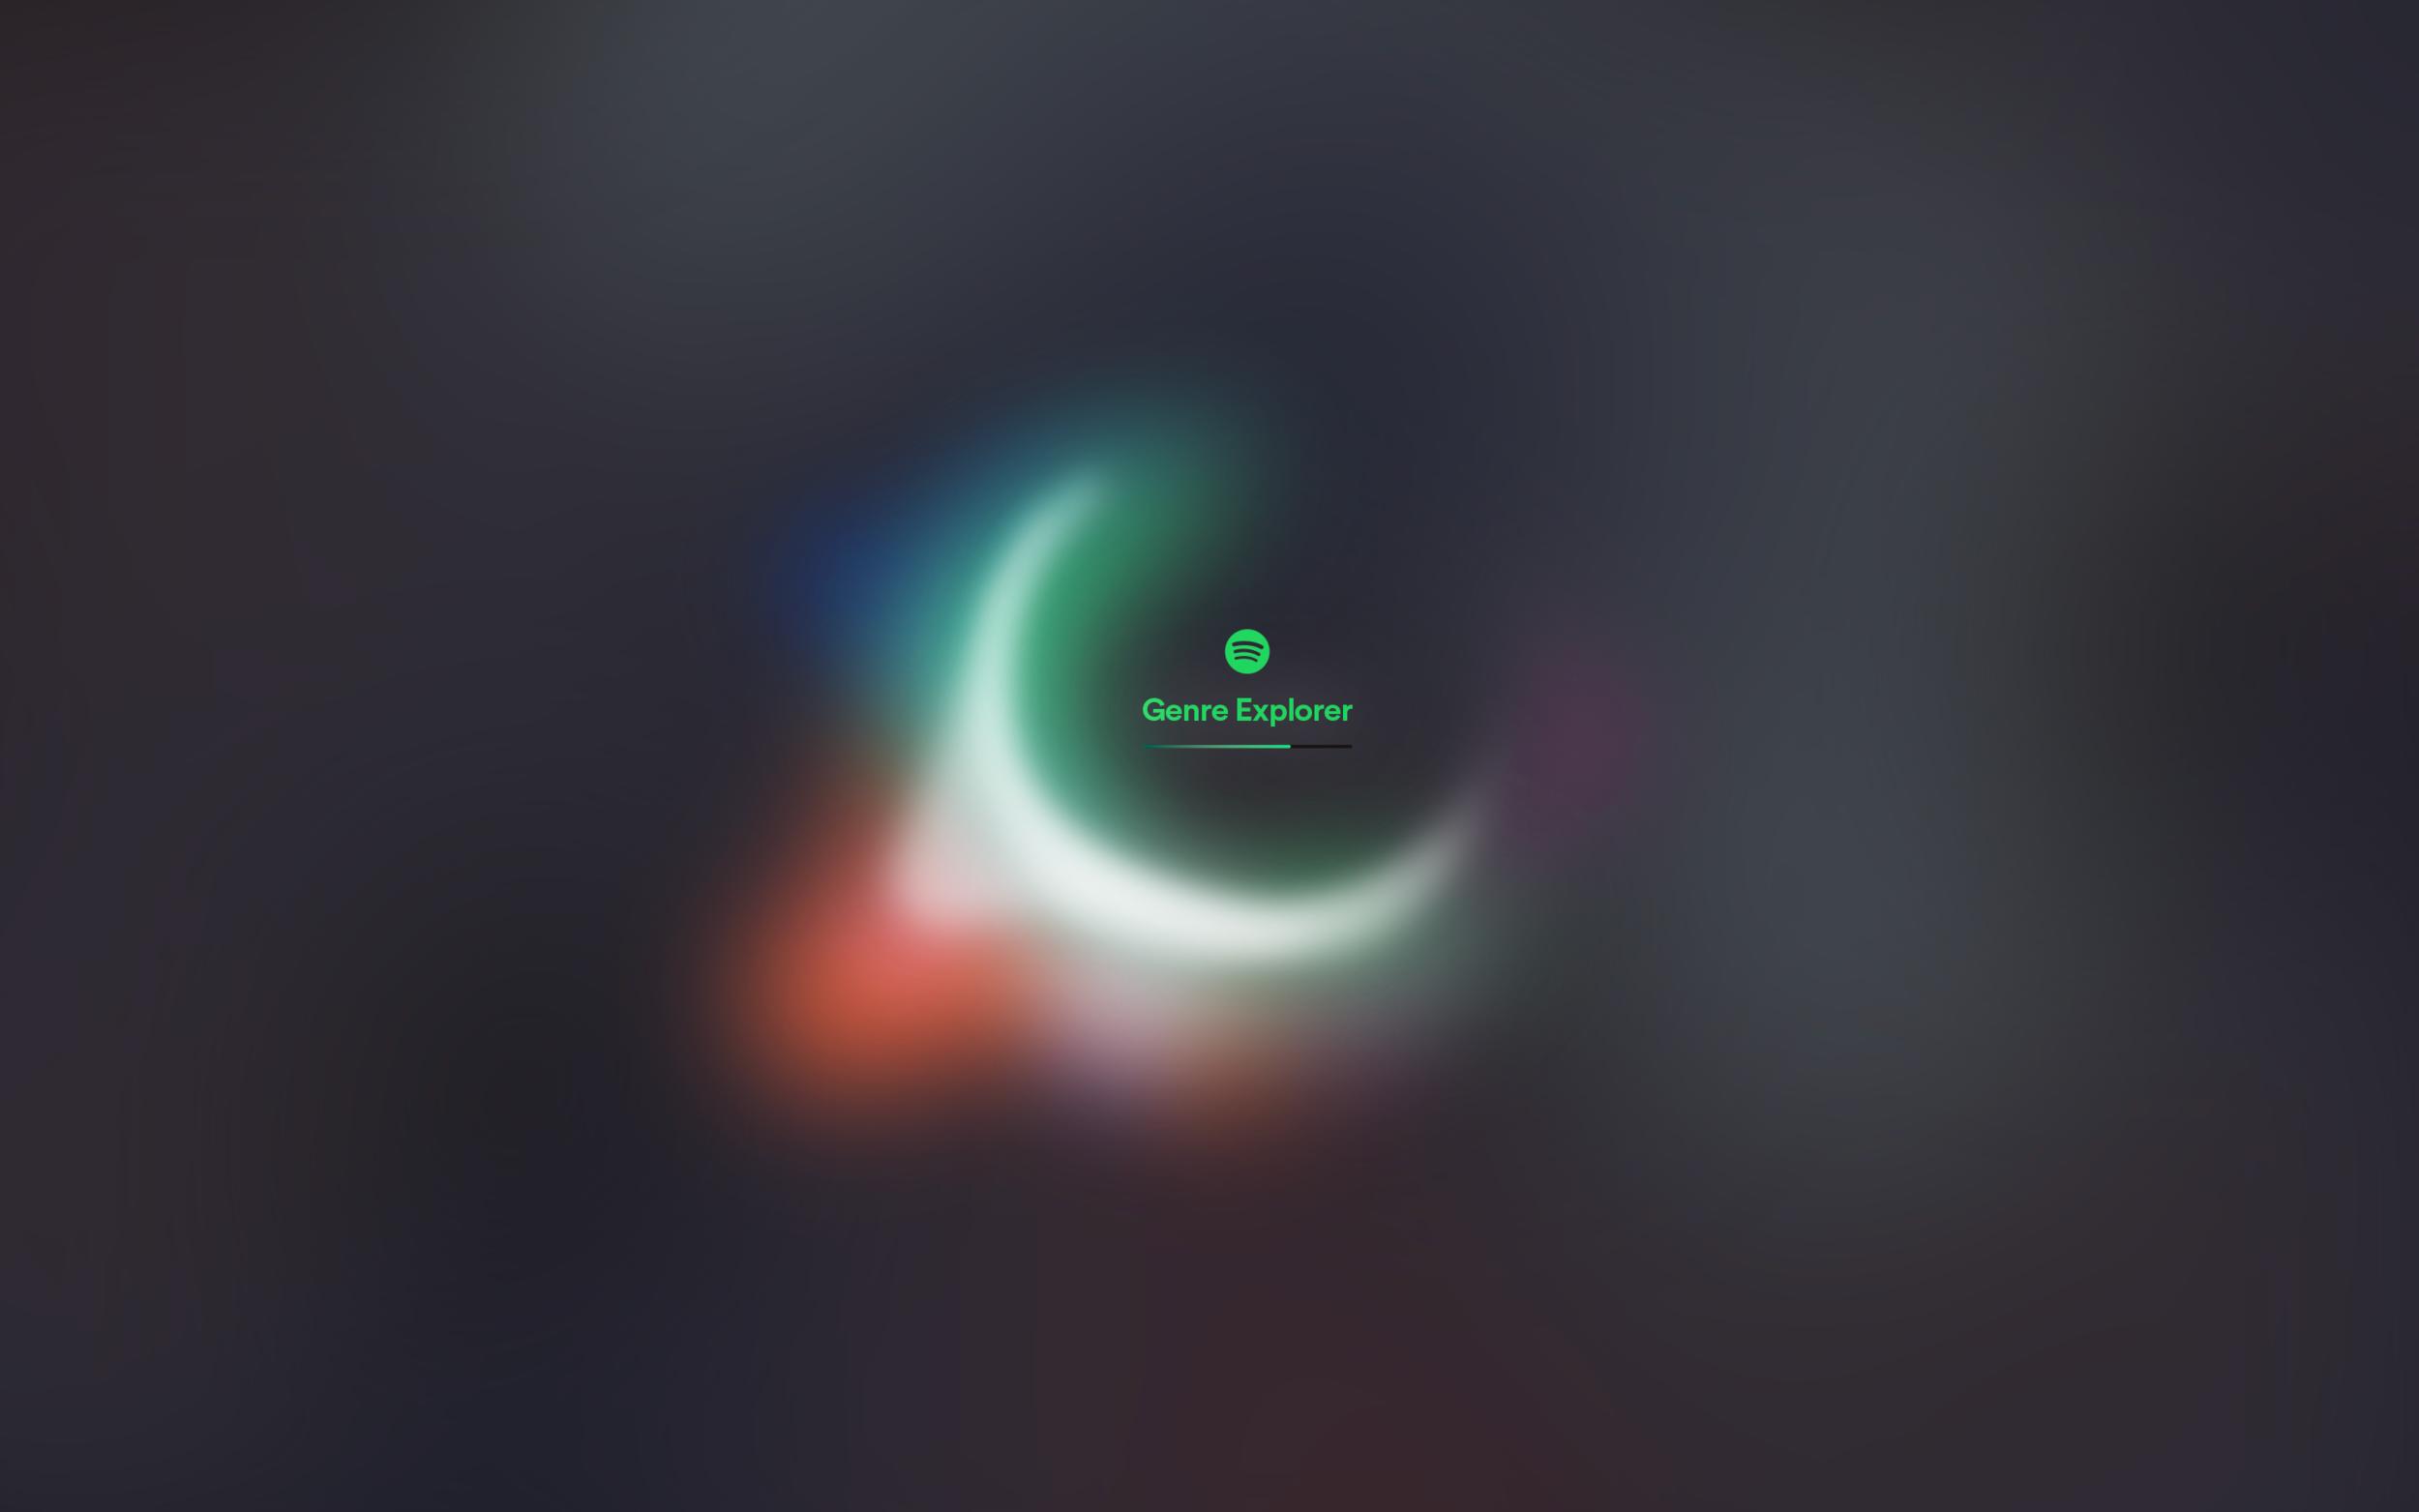 Loading screen